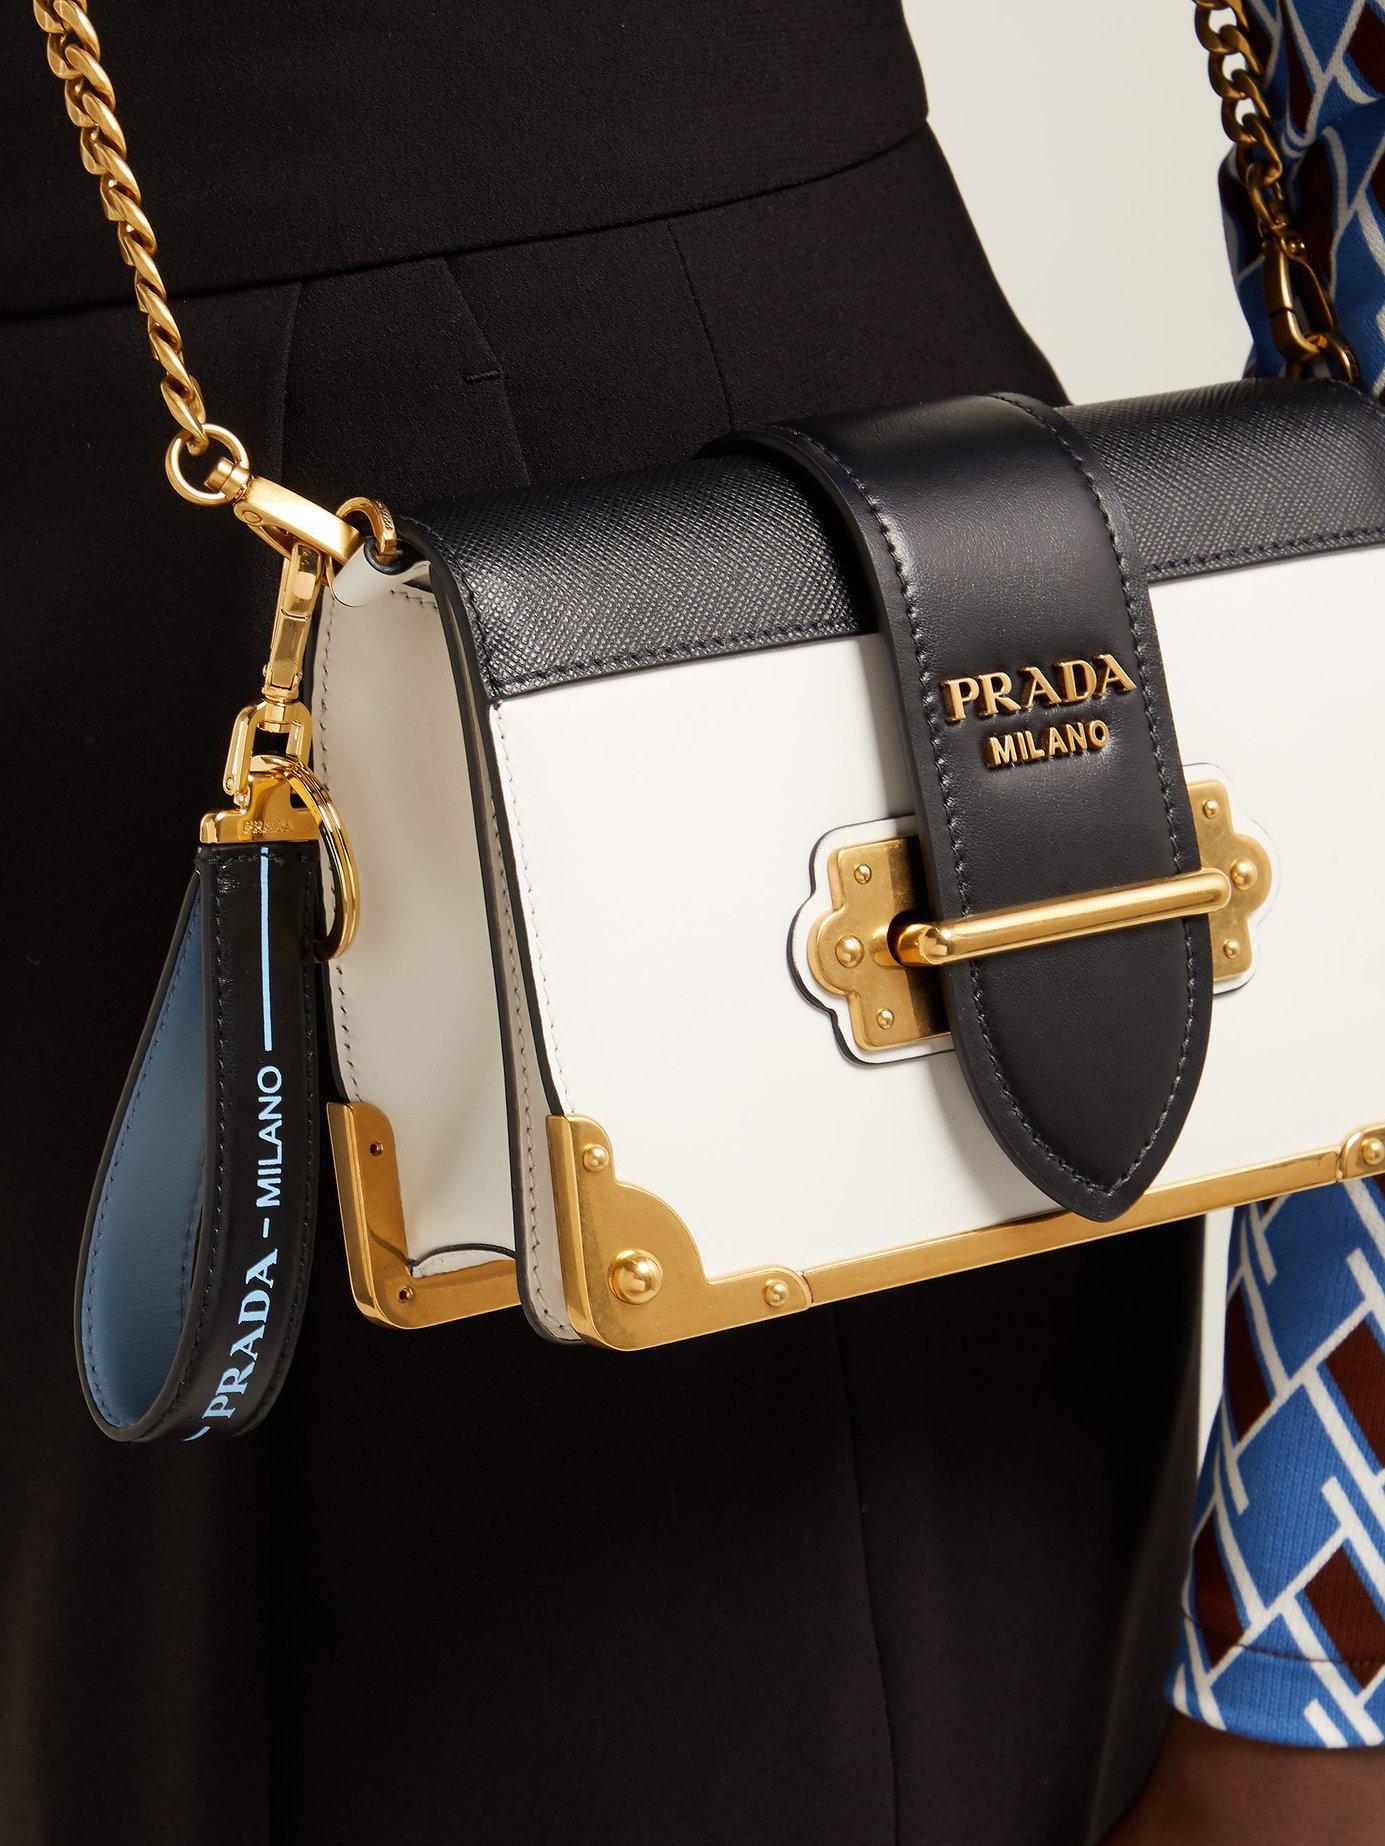 Lyst - Prada Logo Print Leather Key Ring in Black - Save 53% 970f4b6e445fb